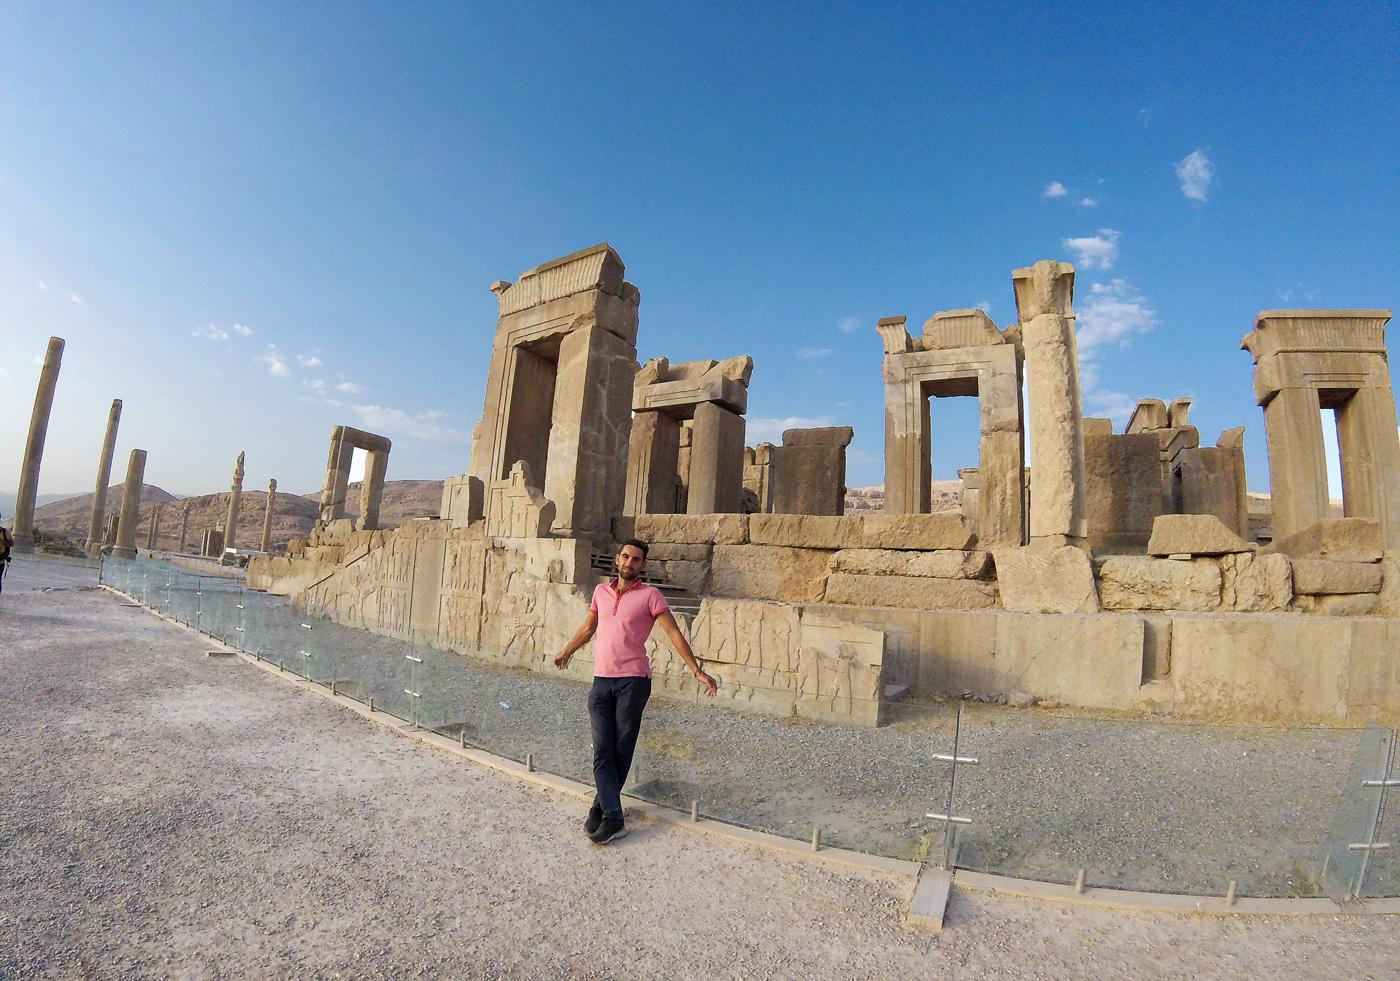 Voyage à vélo, traverser l'Iran à vélo, le Palais de Darius I, le Tachara à Persépolis. Cycling travel, biketouring, cycling Iran, Palace of Darius, Tachara Palace, in Persepolis.